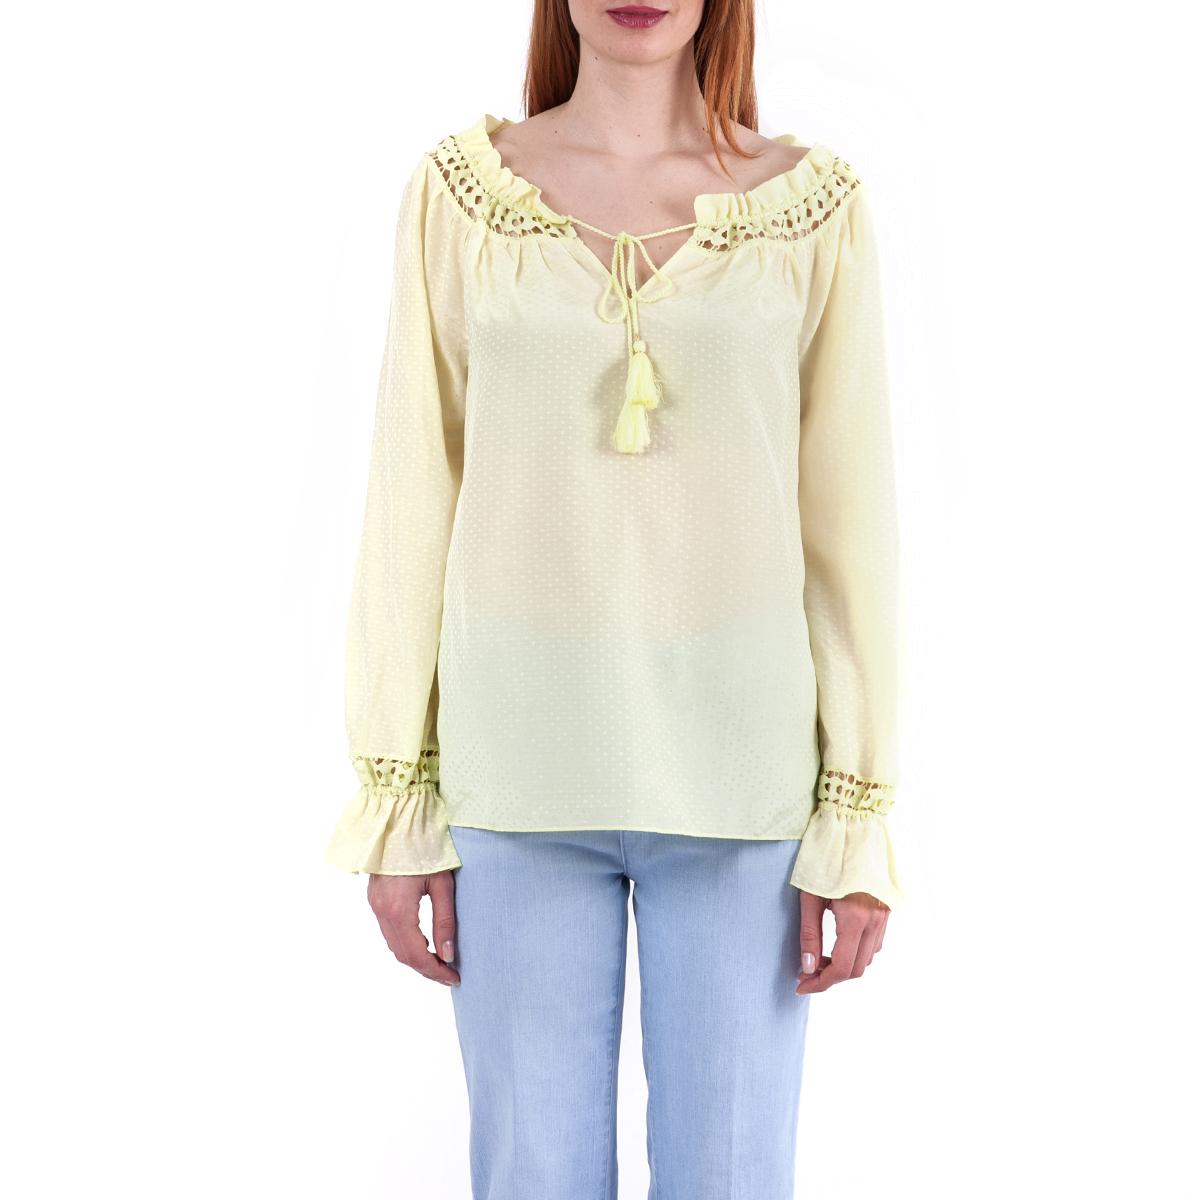 JUICY COUTURE - Γυναικεία μπλούζα Juicy Couture κίτρινη μακρυμάνικη